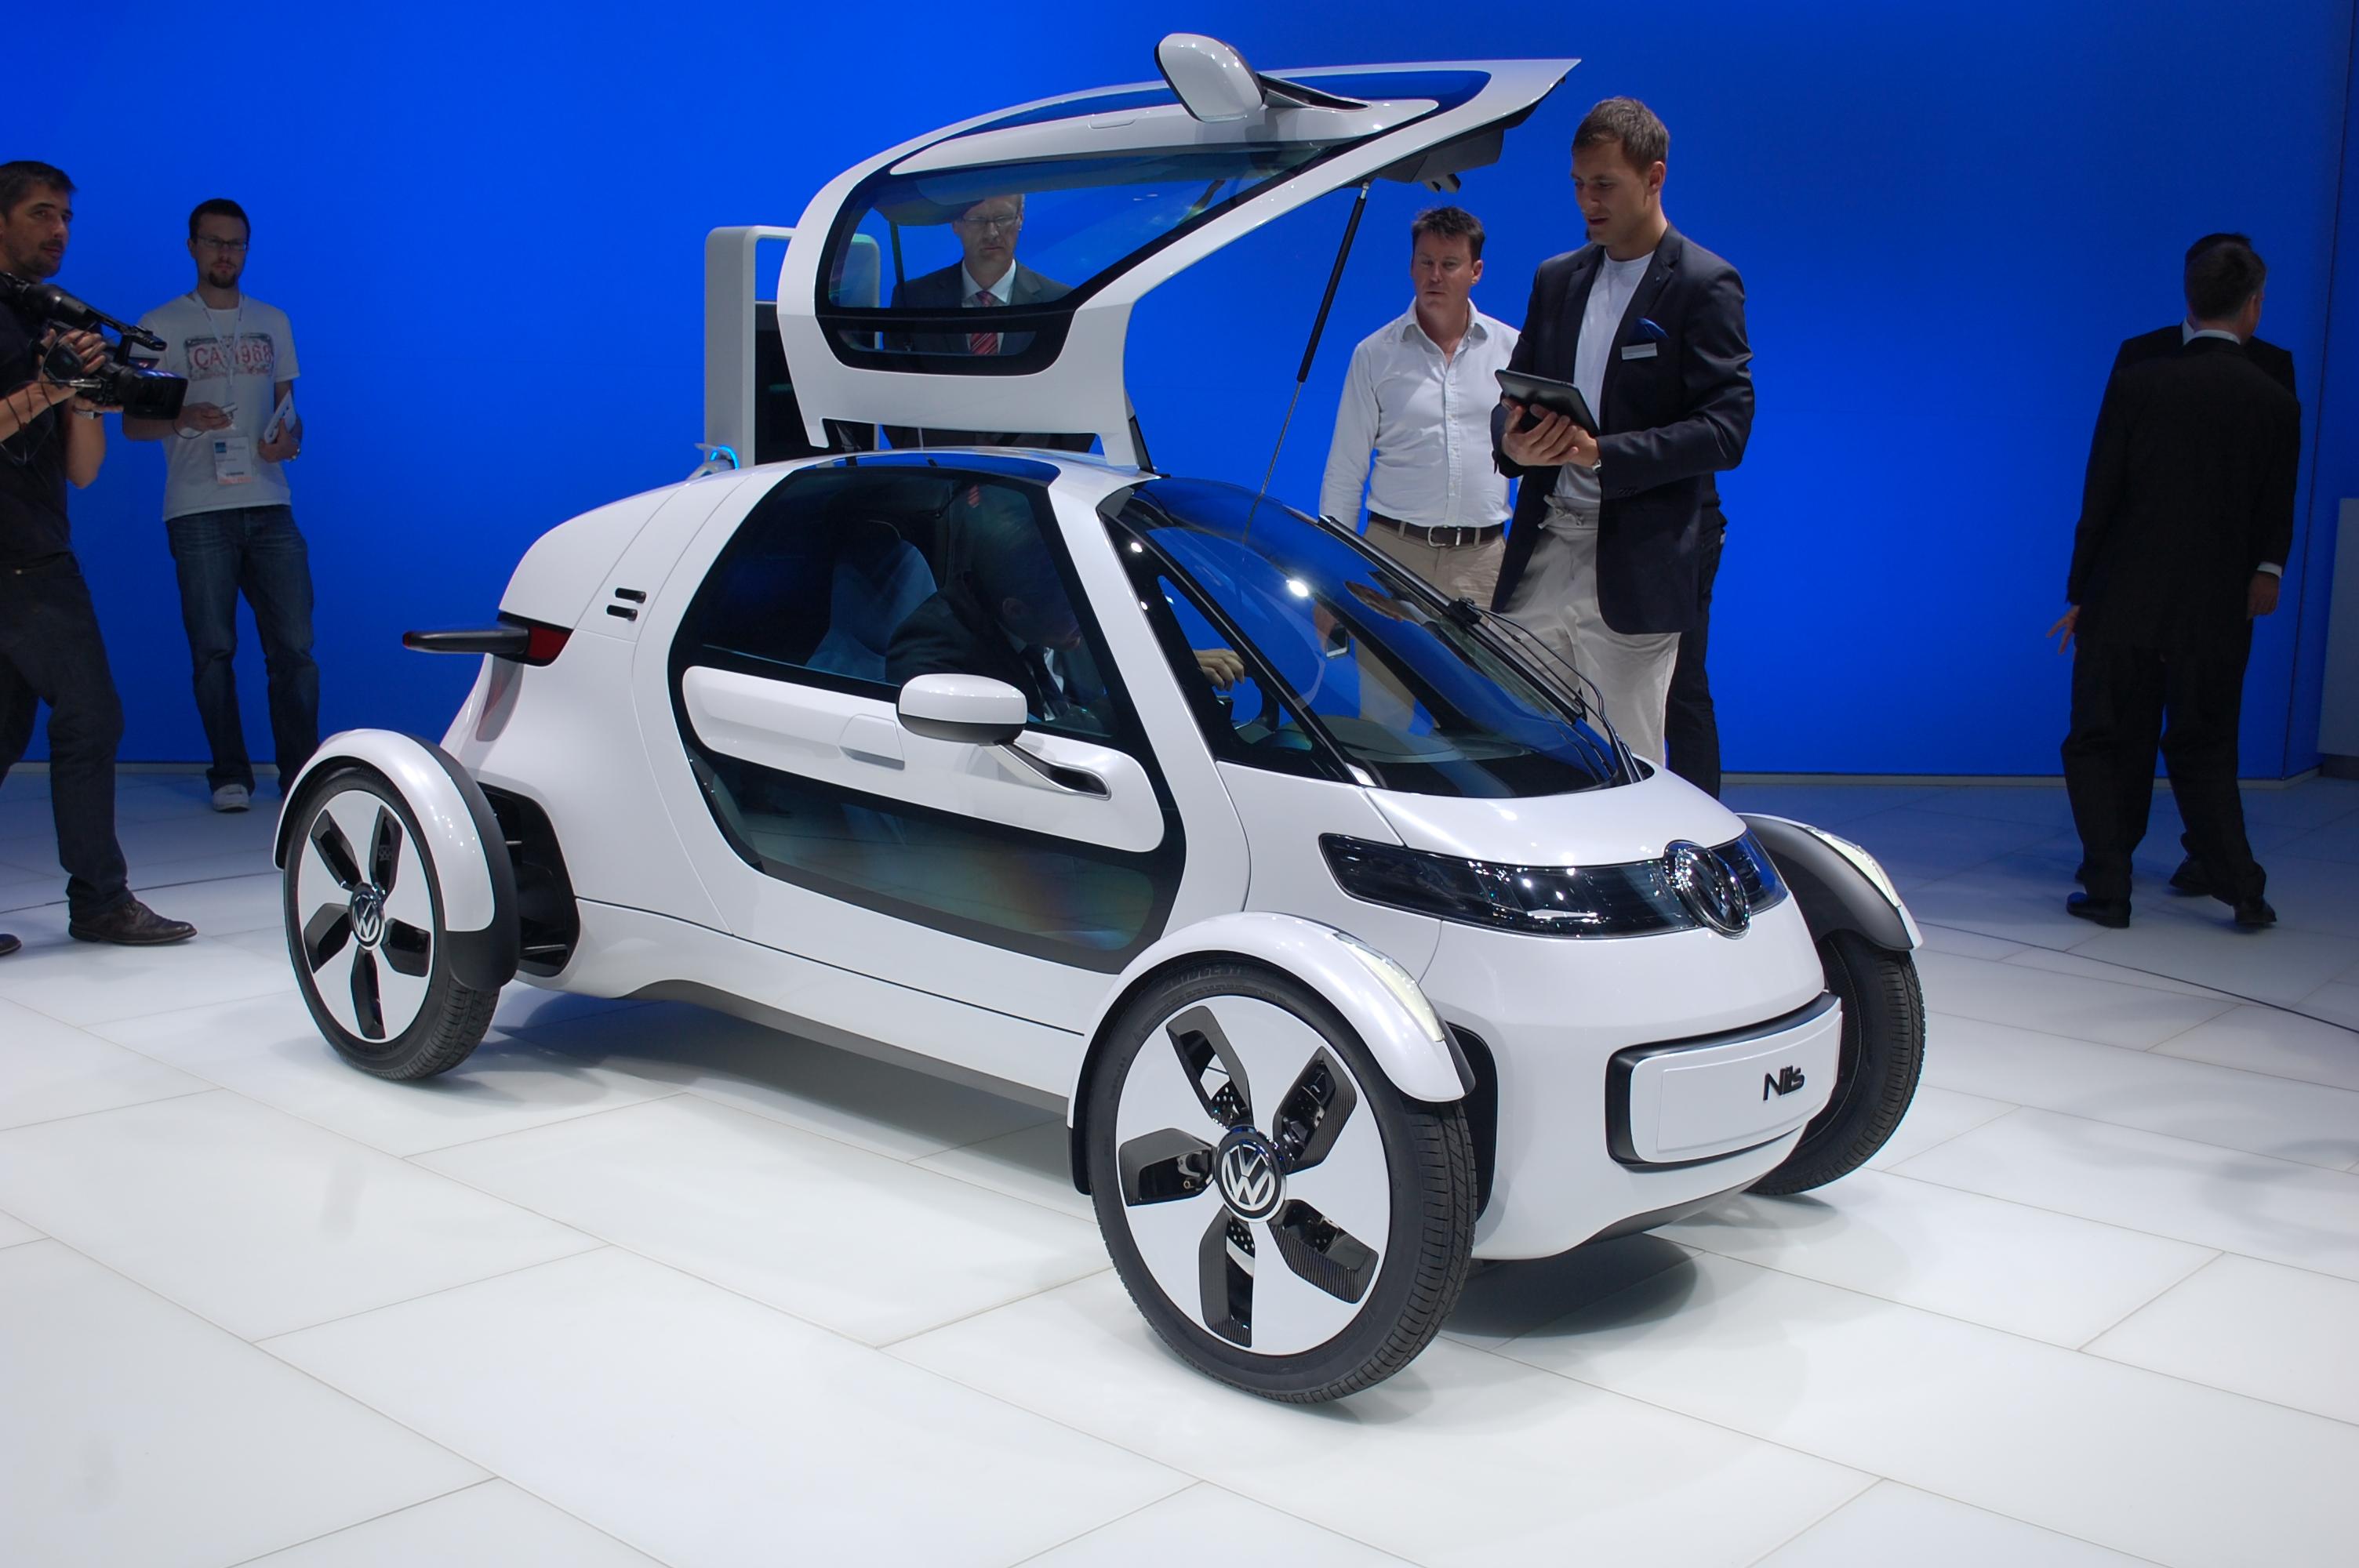 Volkswagen Nils Electric Car Concept Frankfurt Live Photos - Volkswagen car show